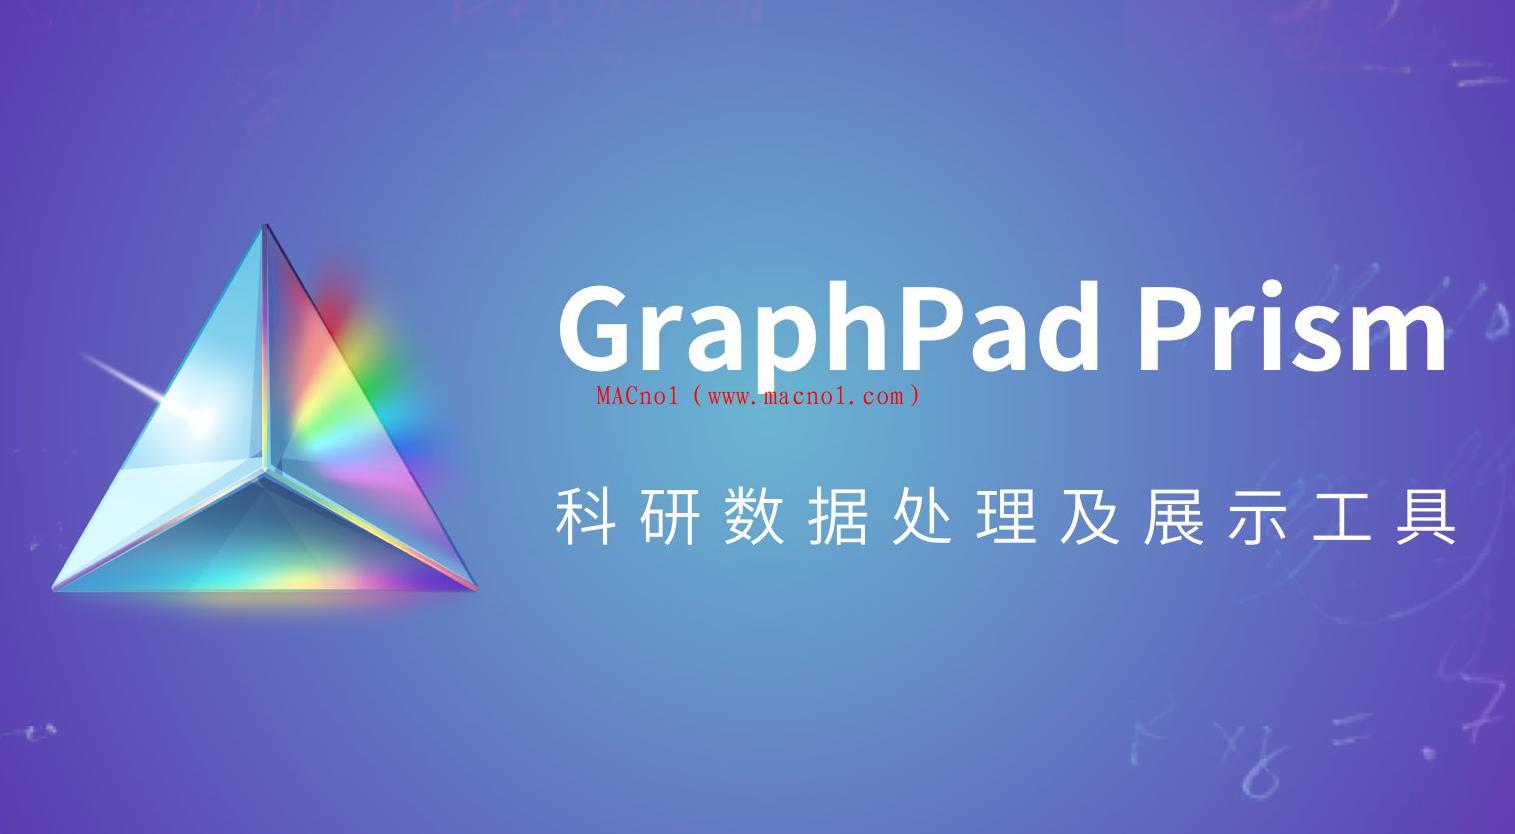 科研绘图软件 GraphPad Prism for Mac v9.0.0 破解版(附注册码)